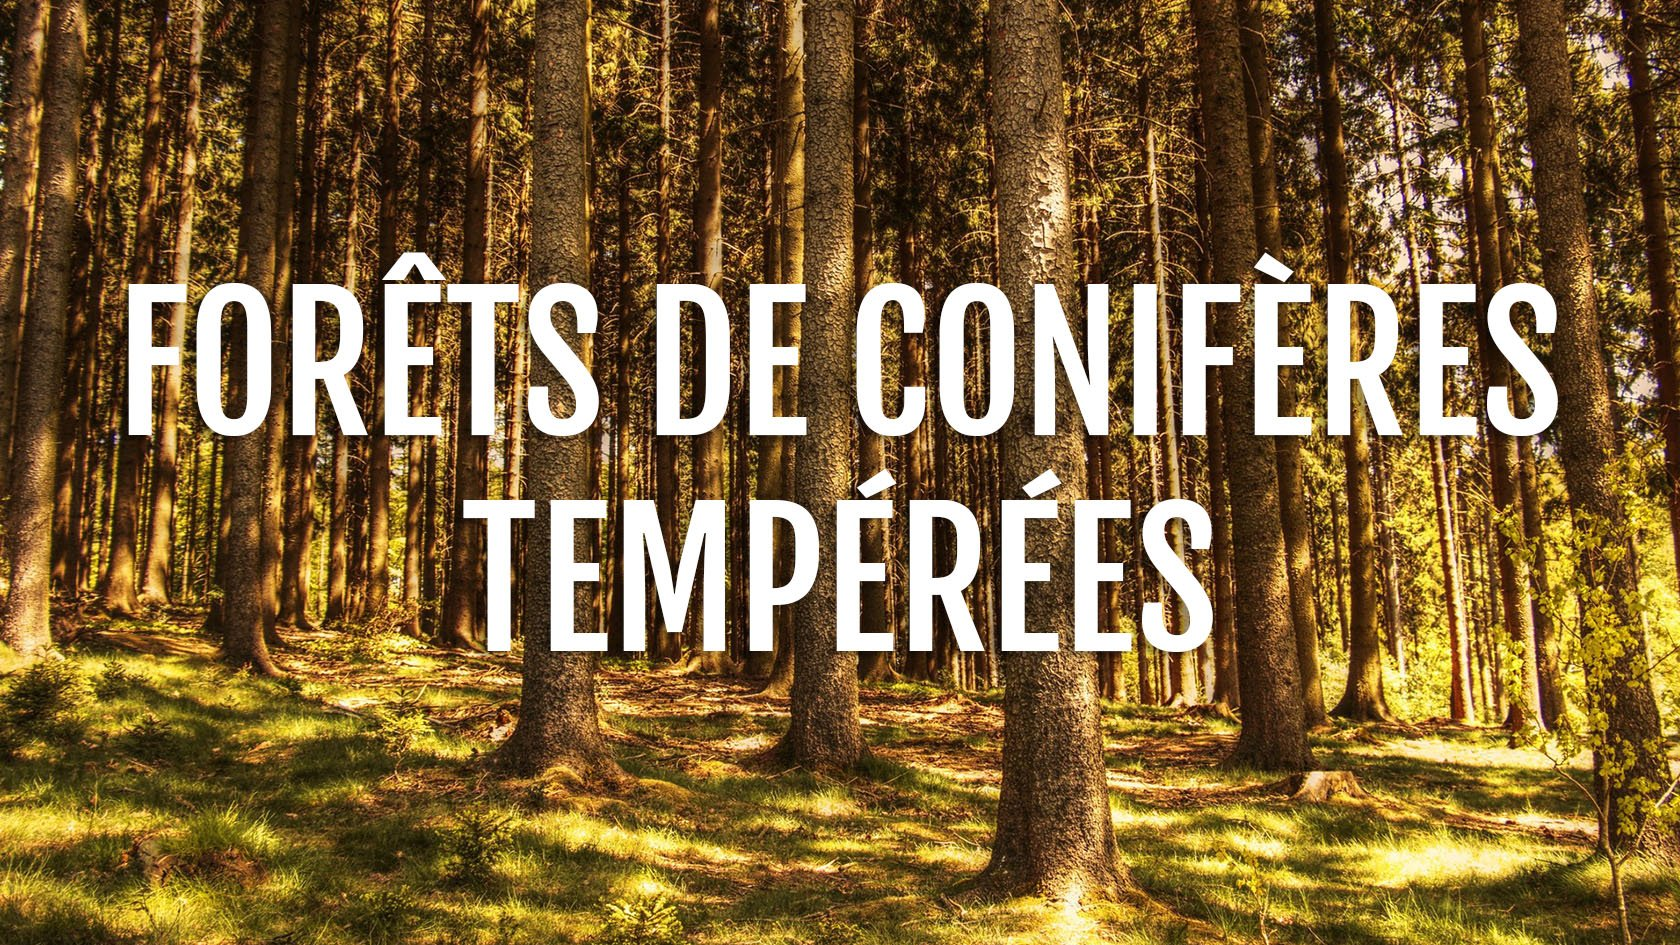 https://www.monde-animal.fr/habitat/forets-de-coniferes-temperees/